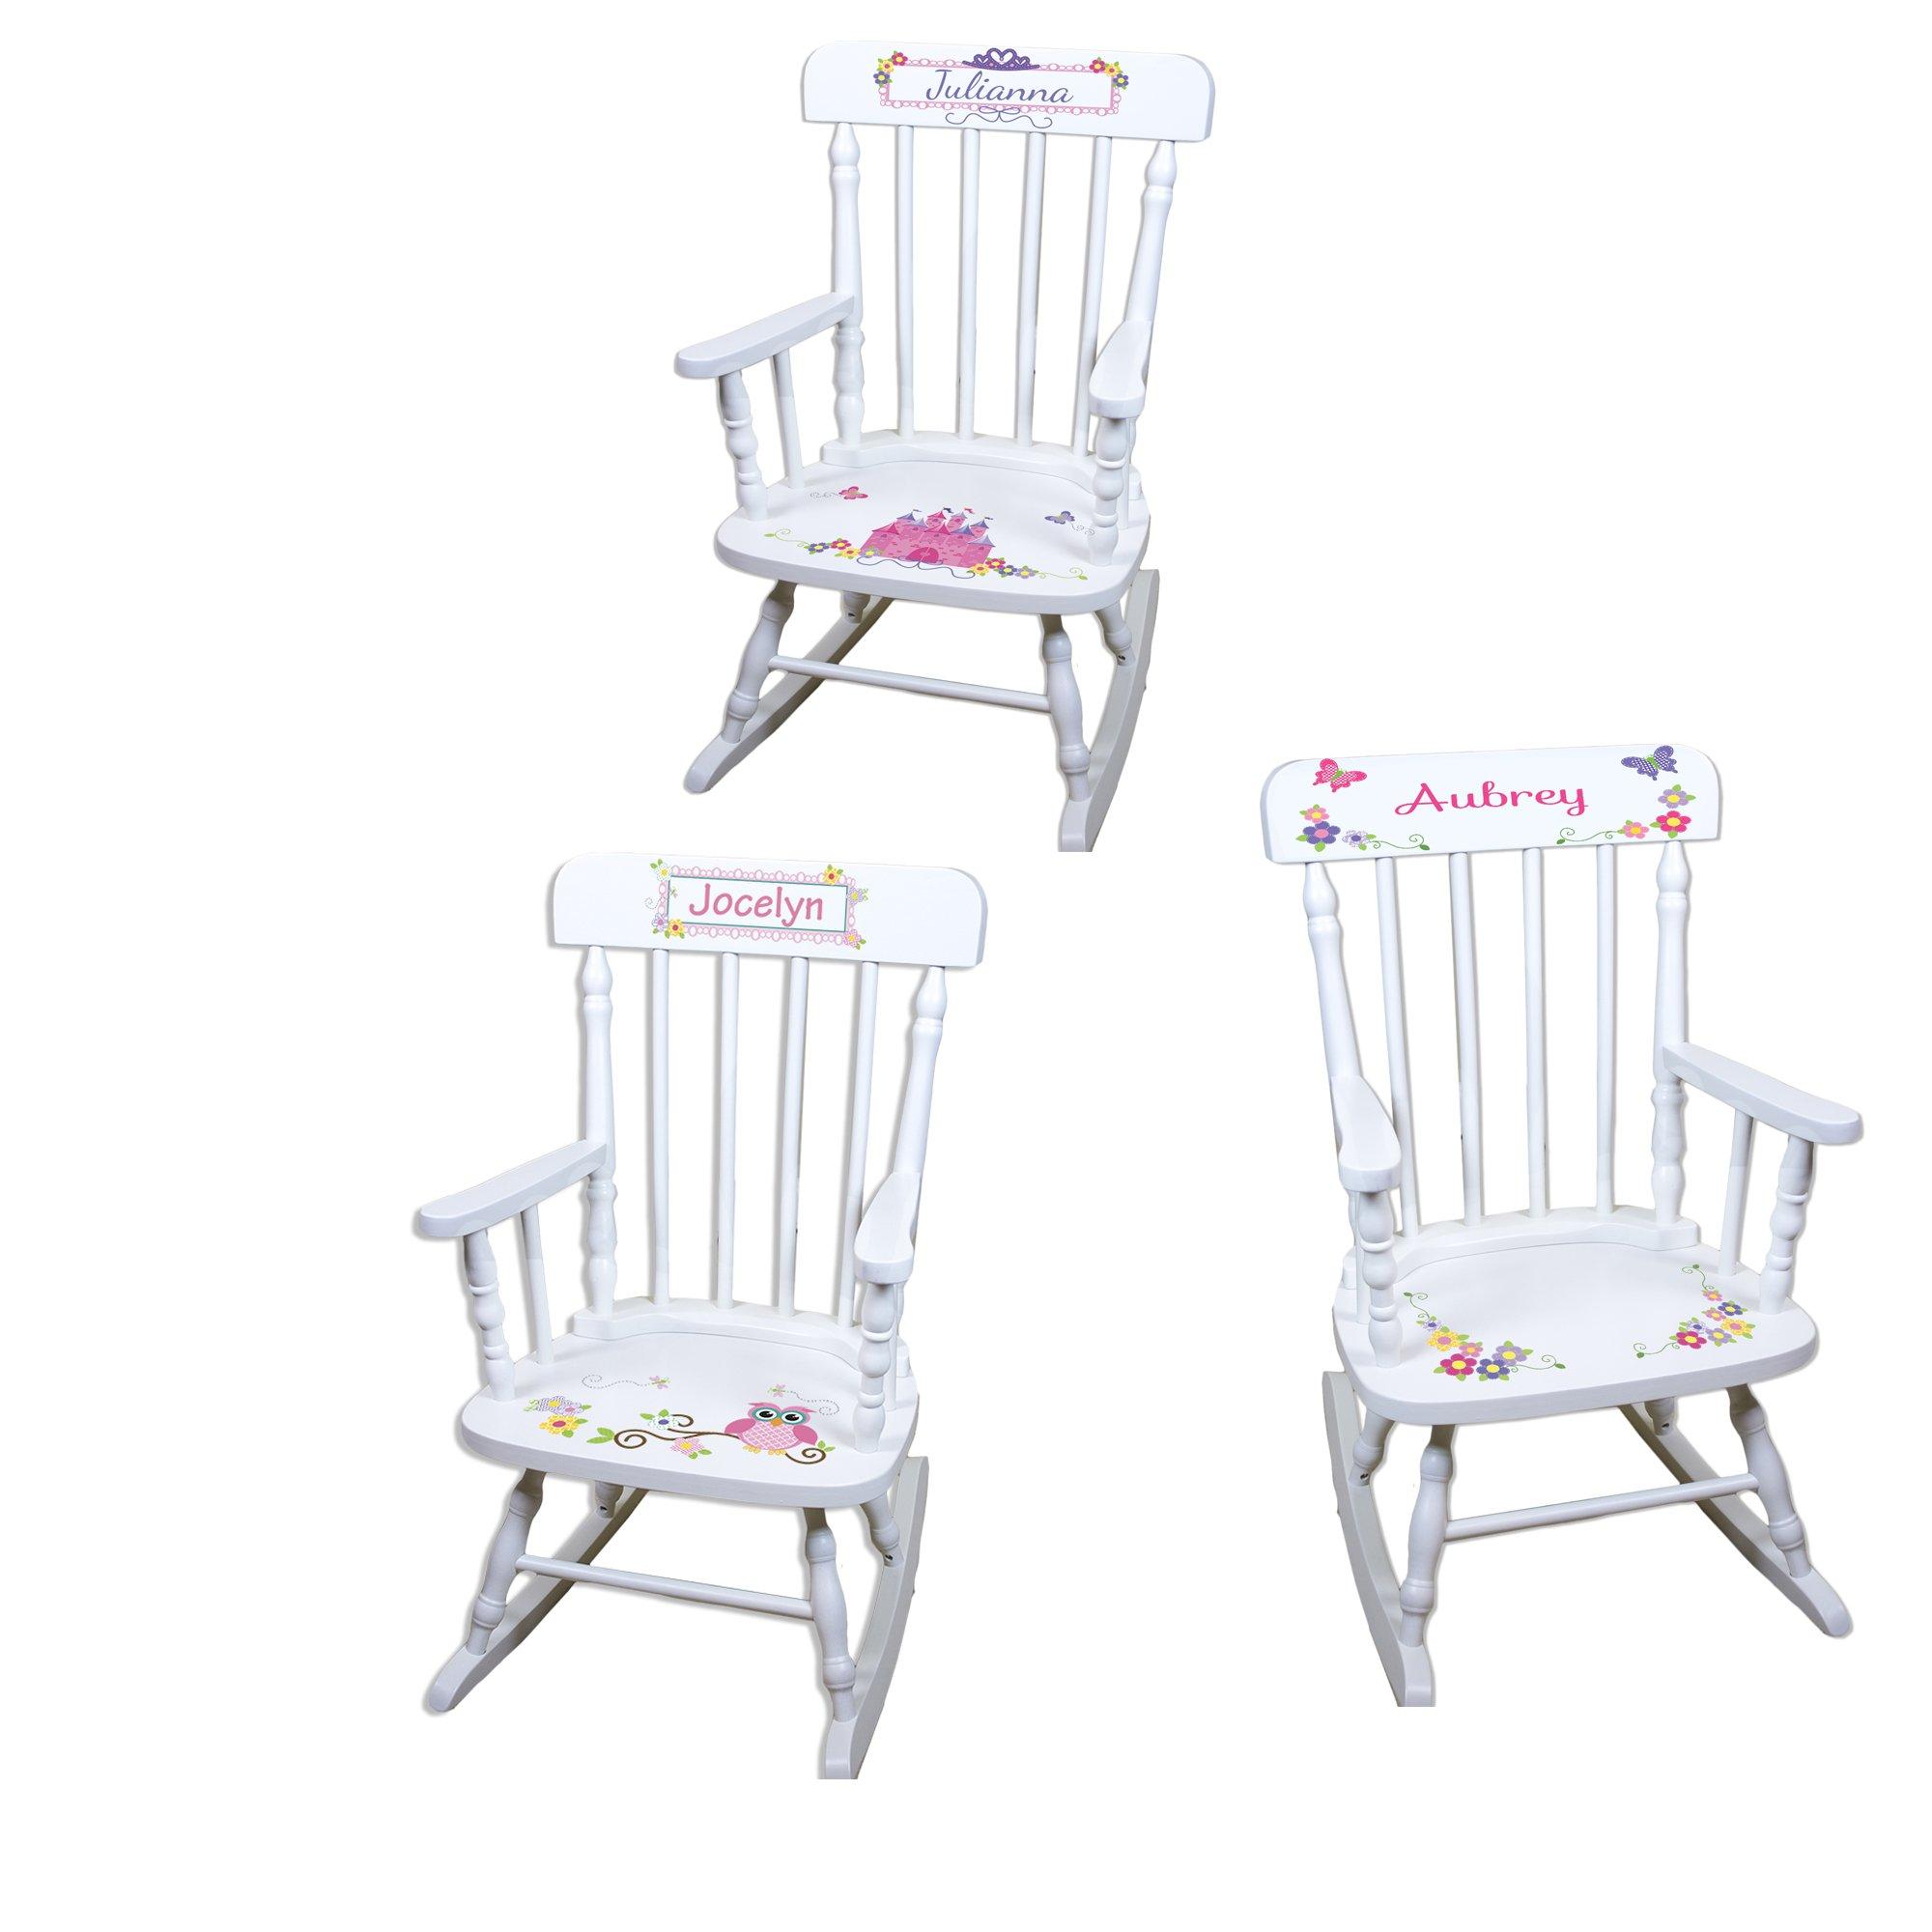 Personalized Girls Rocking Chair-white by MyBambino